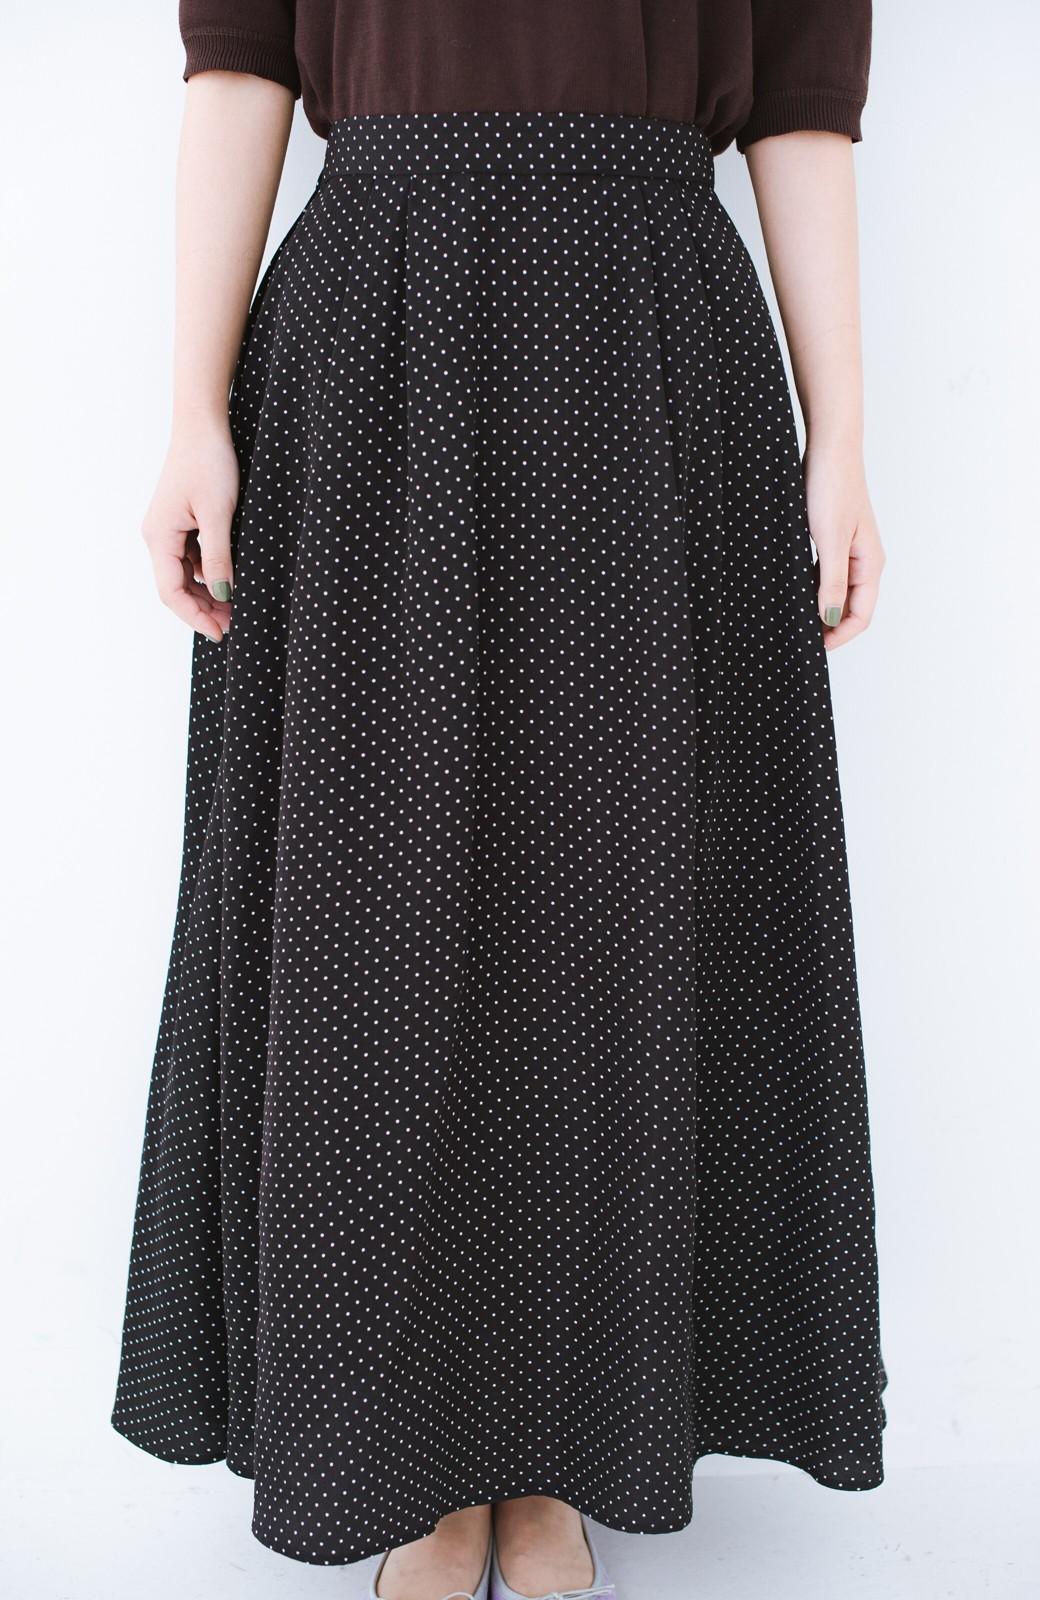 haco! ずっと着られる大人のドットロングスカート by que made me <ブラック系その他>の商品写真4